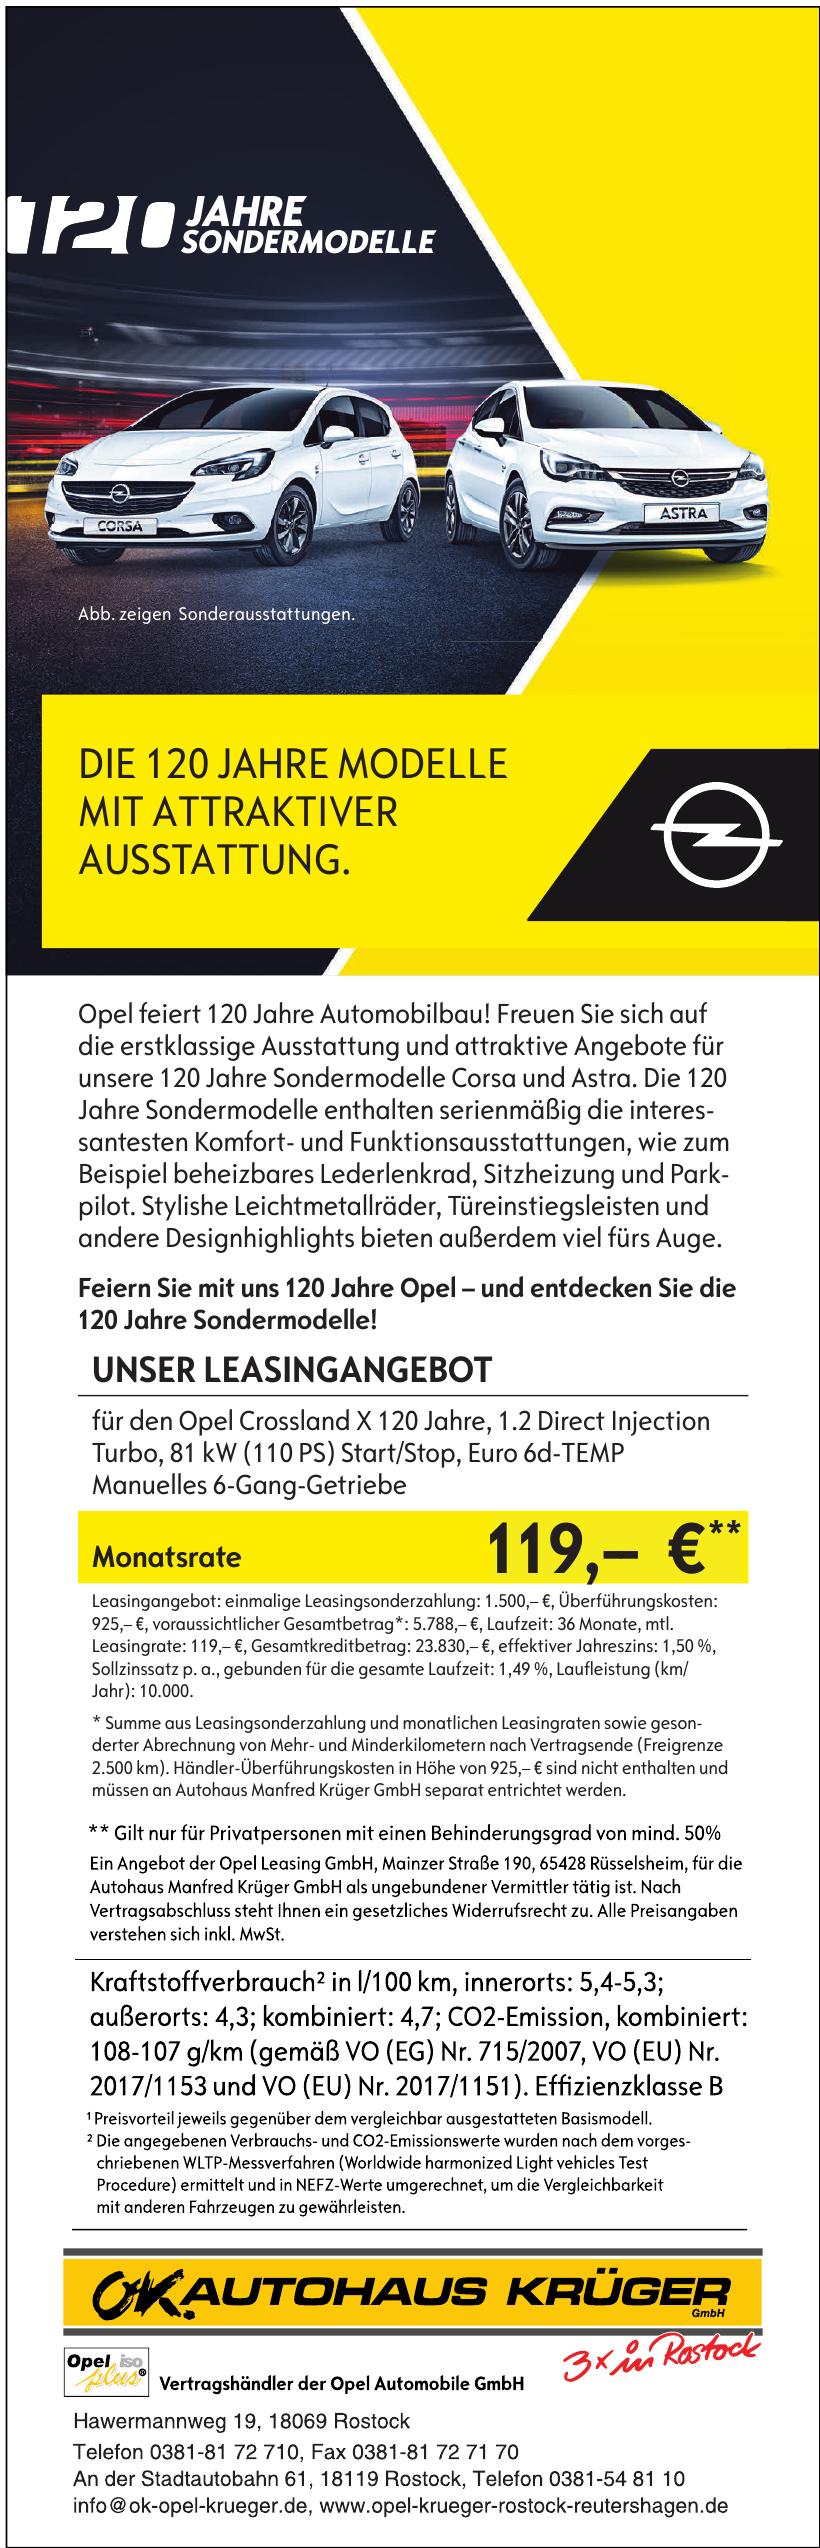 Autohaus Krüger GmbH